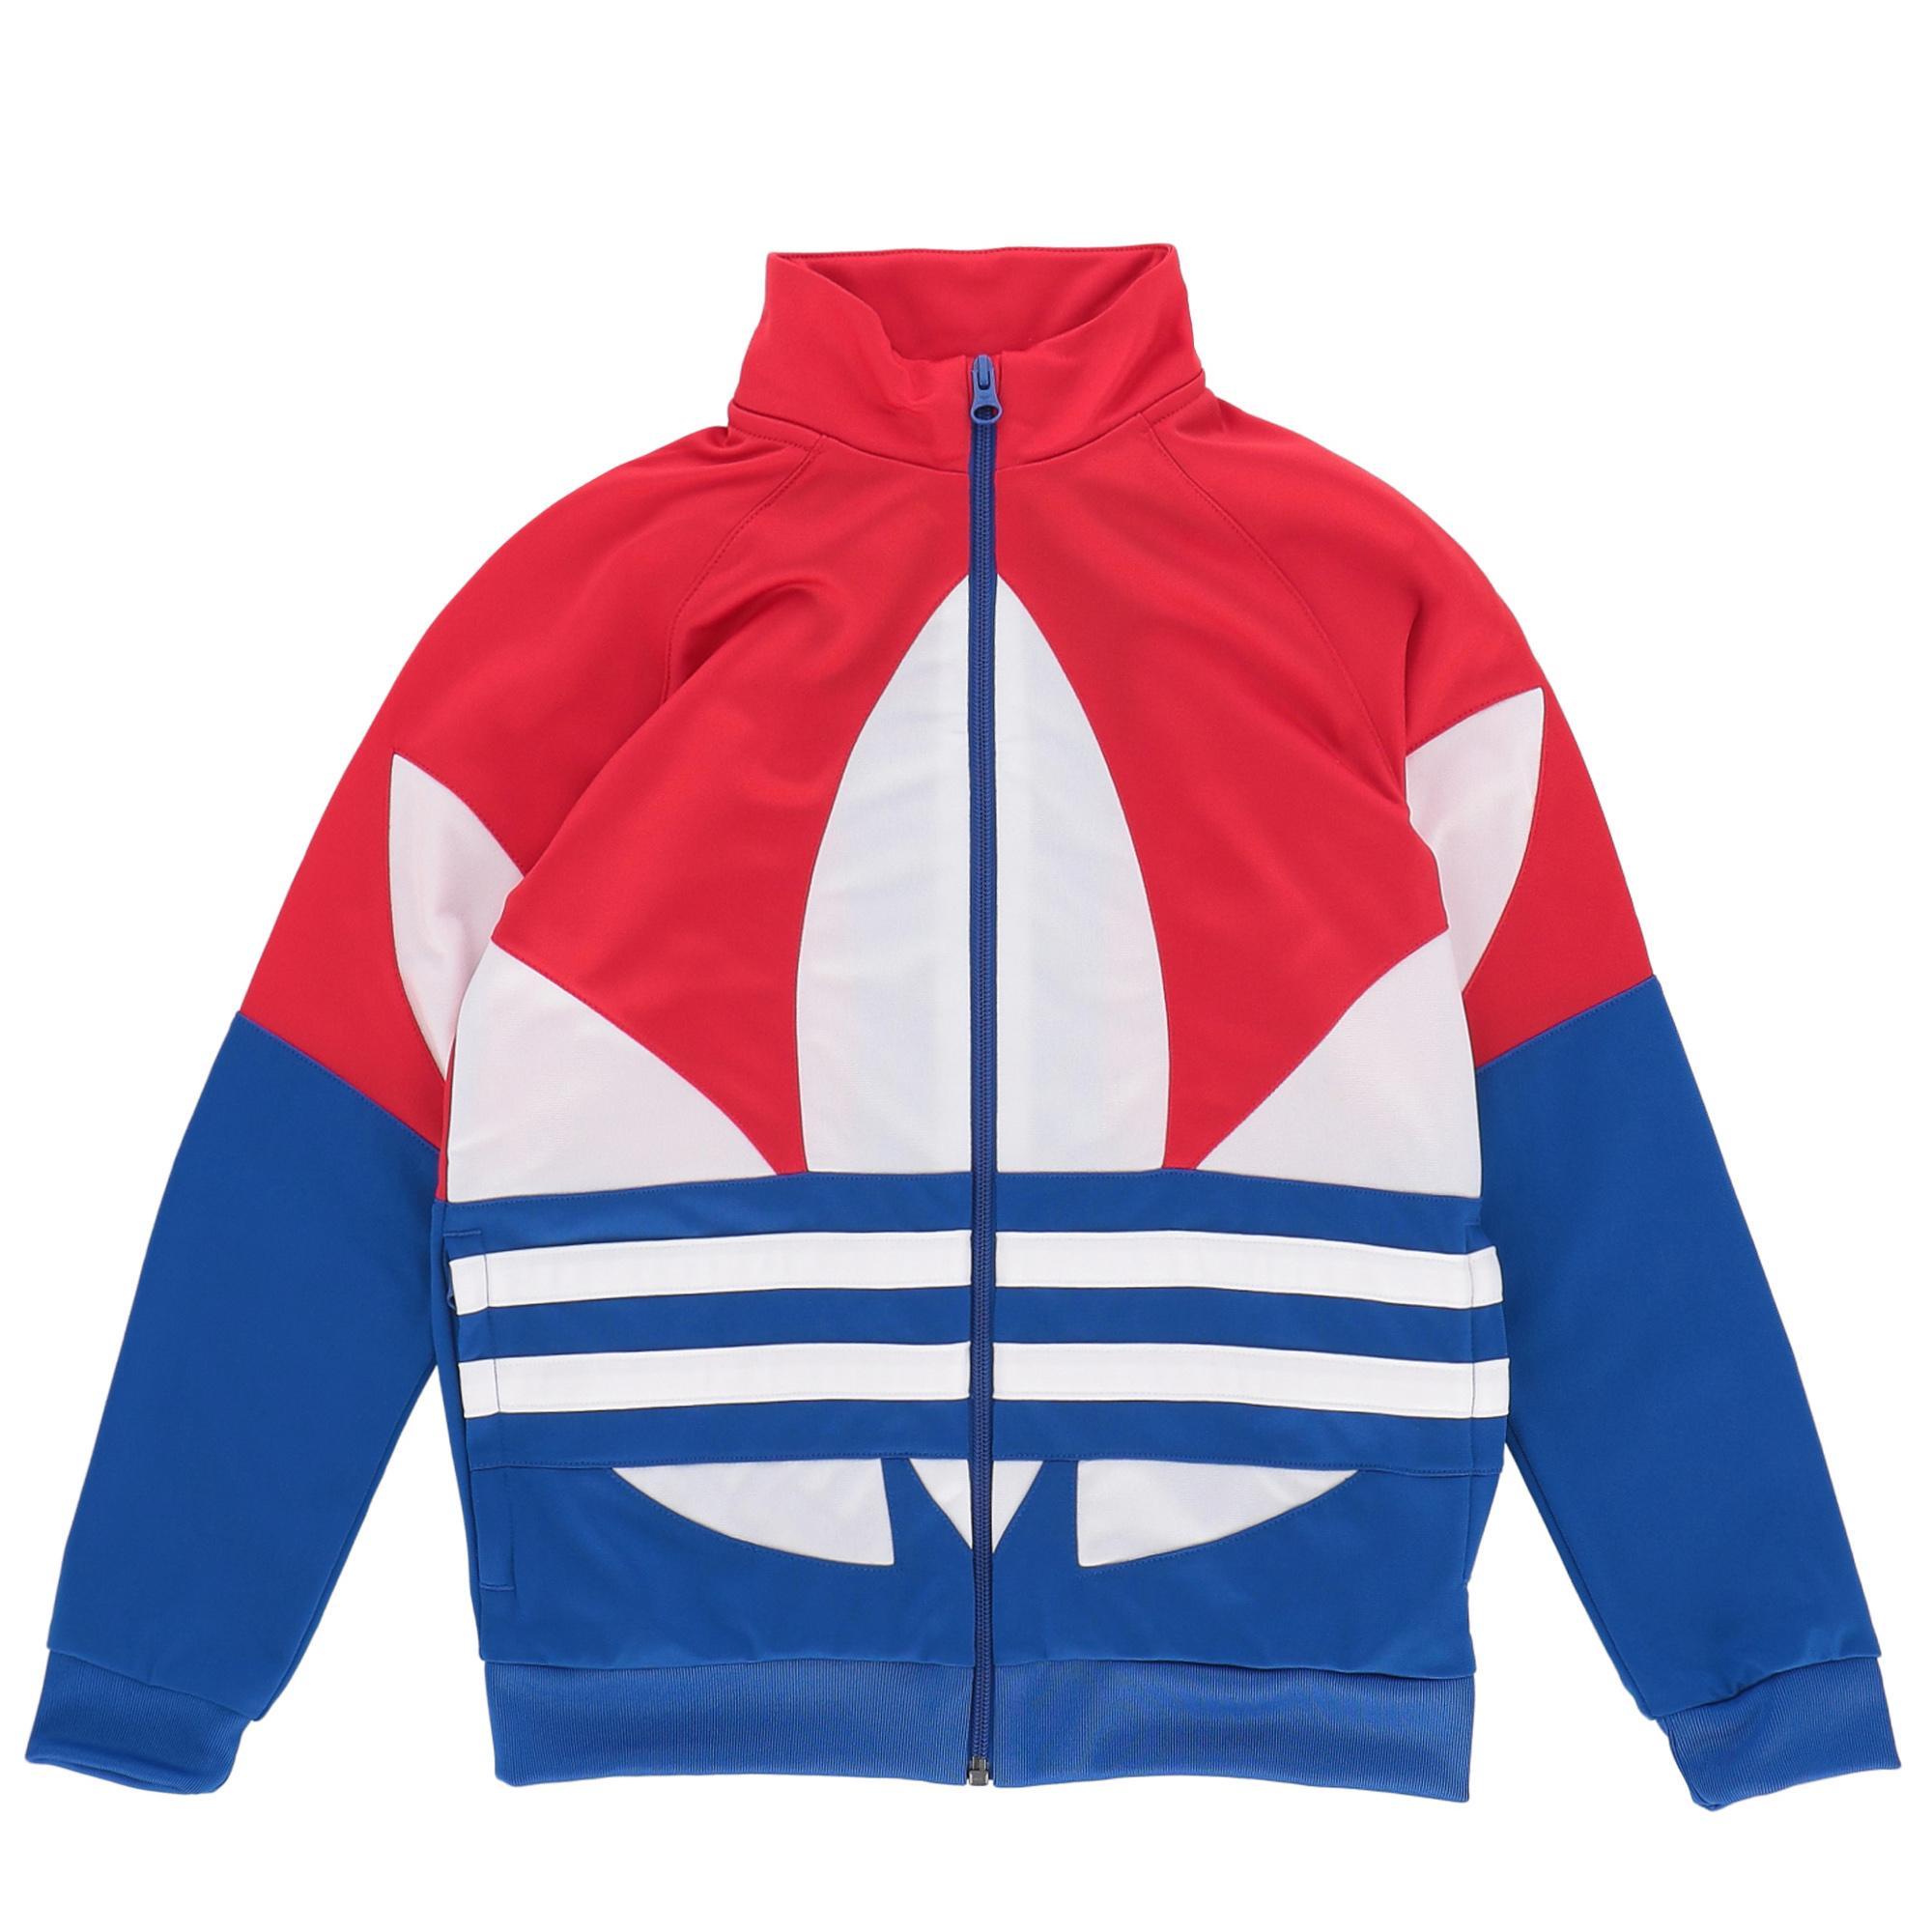 Adidas Big Trefoil Tt Scarlet team royal blue white